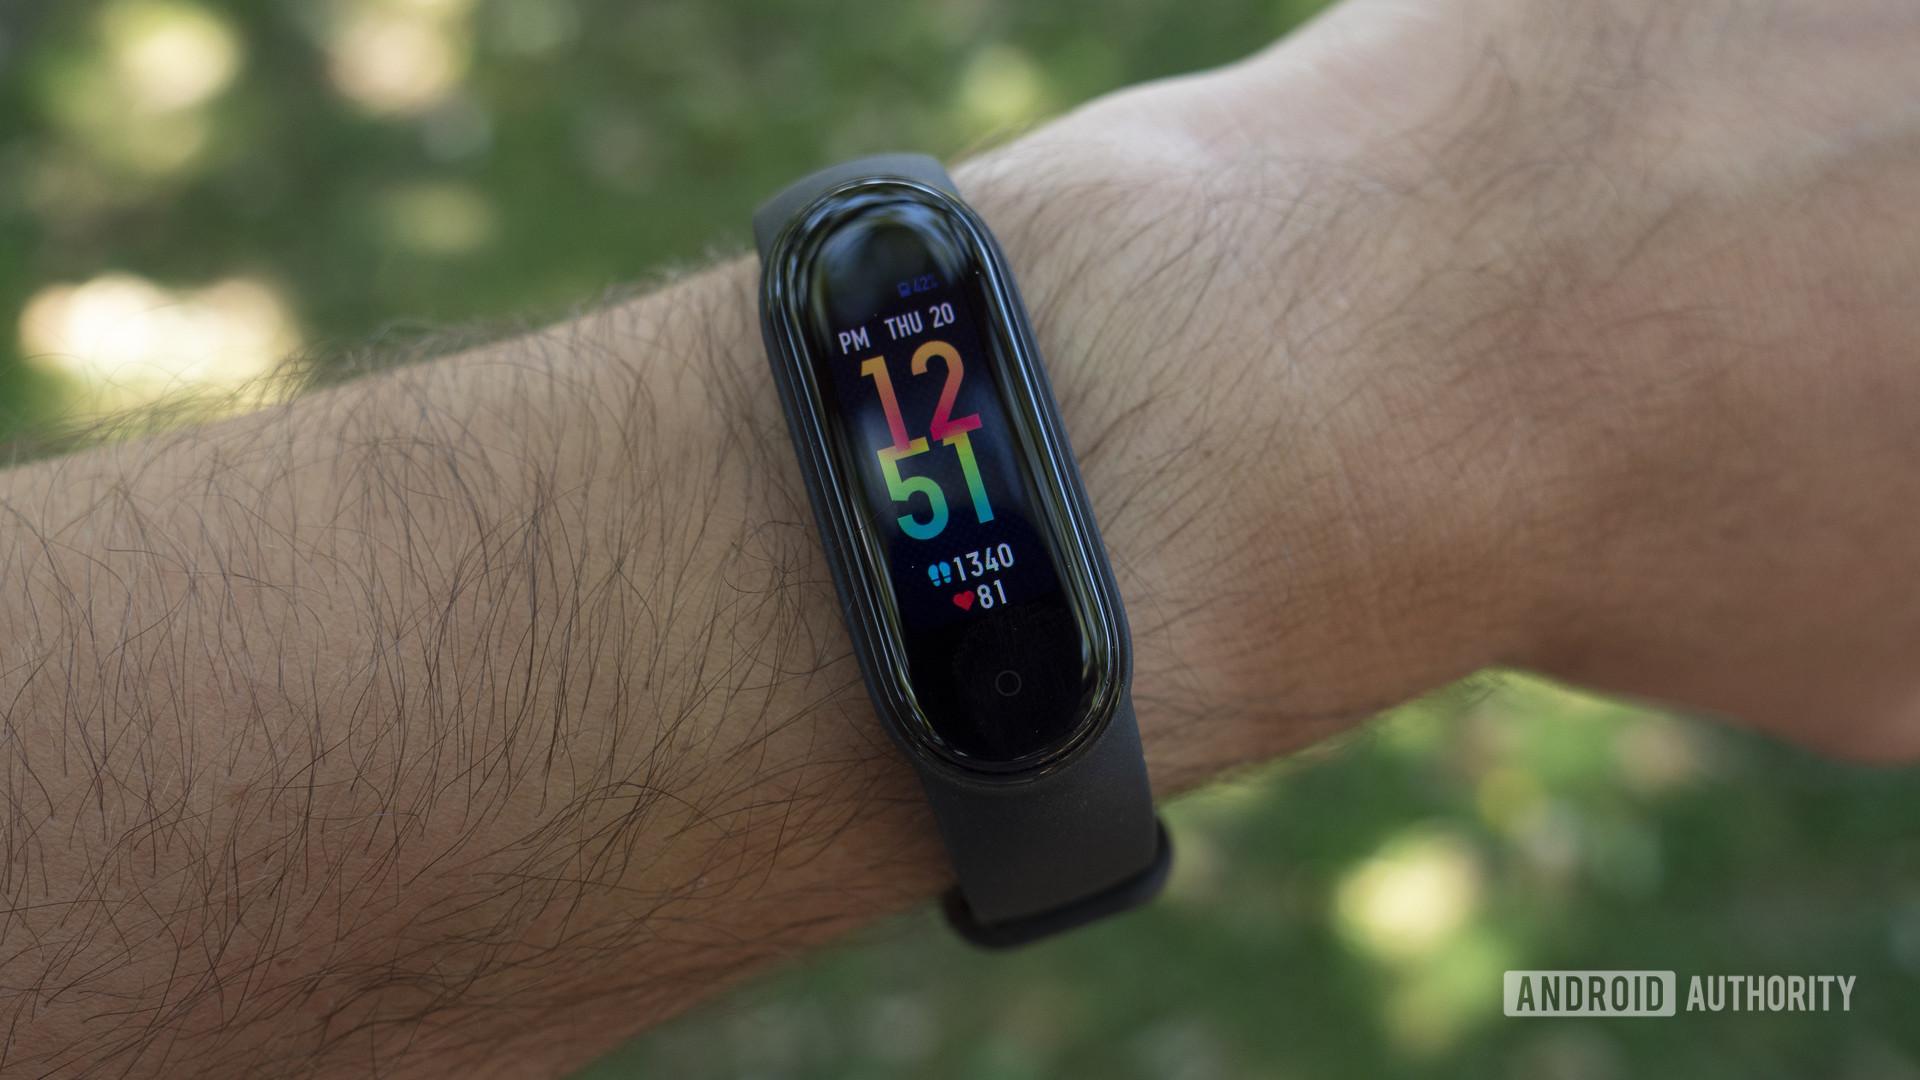 xiaomi mi band 5 review on wrist clock face